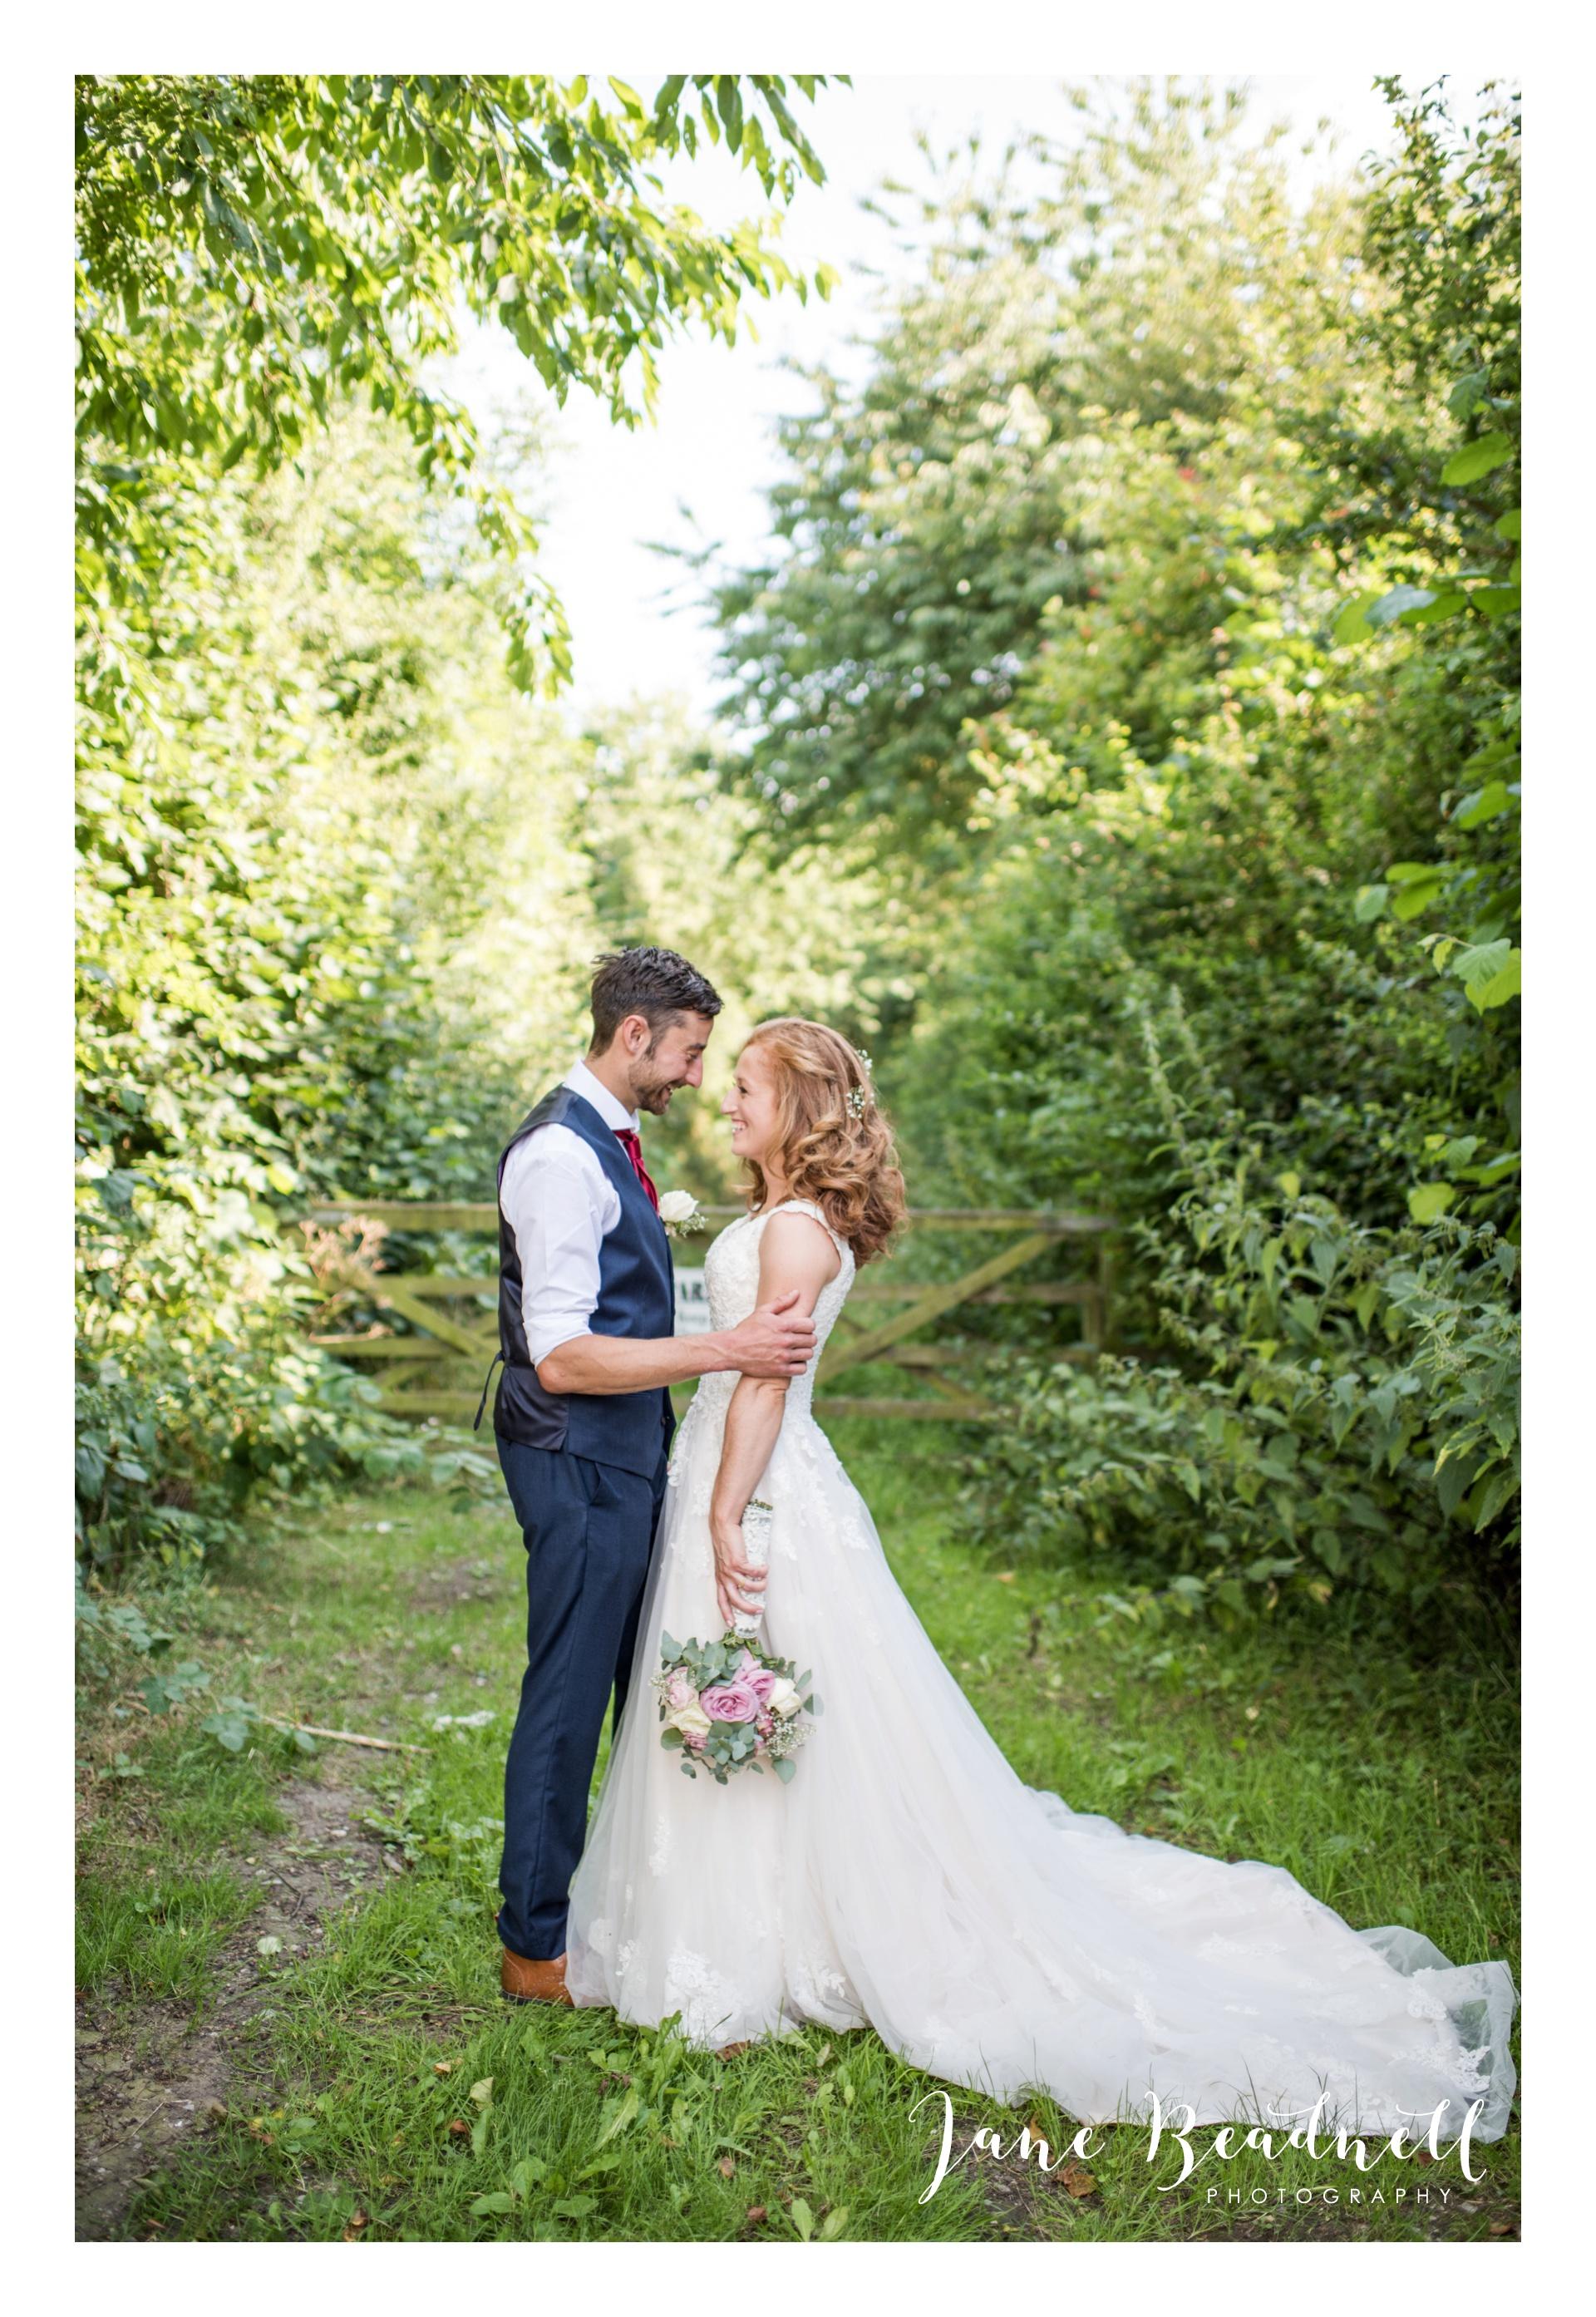 yorkshire-fine-art-wedding-photographer-jane-beadnell-photography-poppleton-york_0102